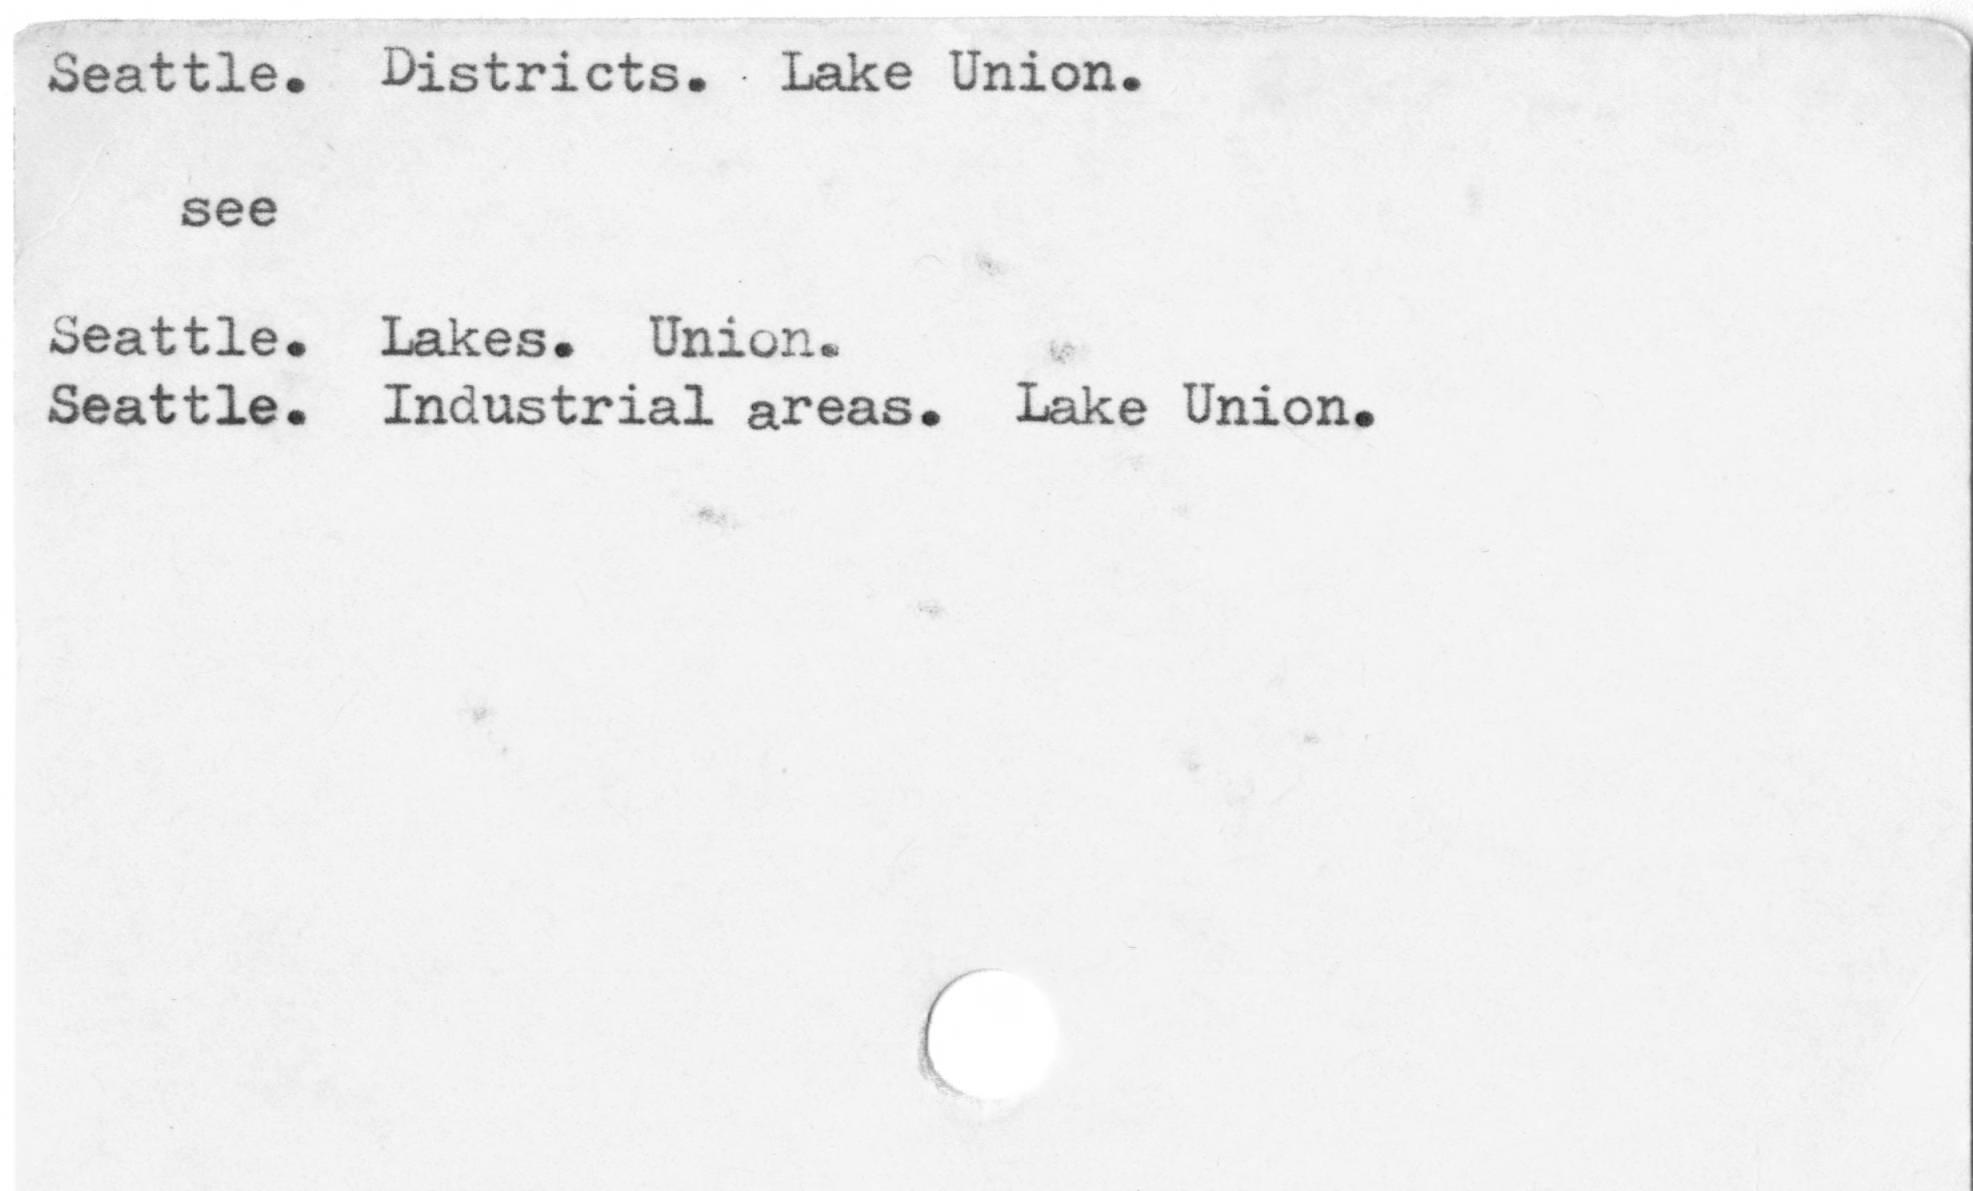 Seattle. Districts. Lake Union.